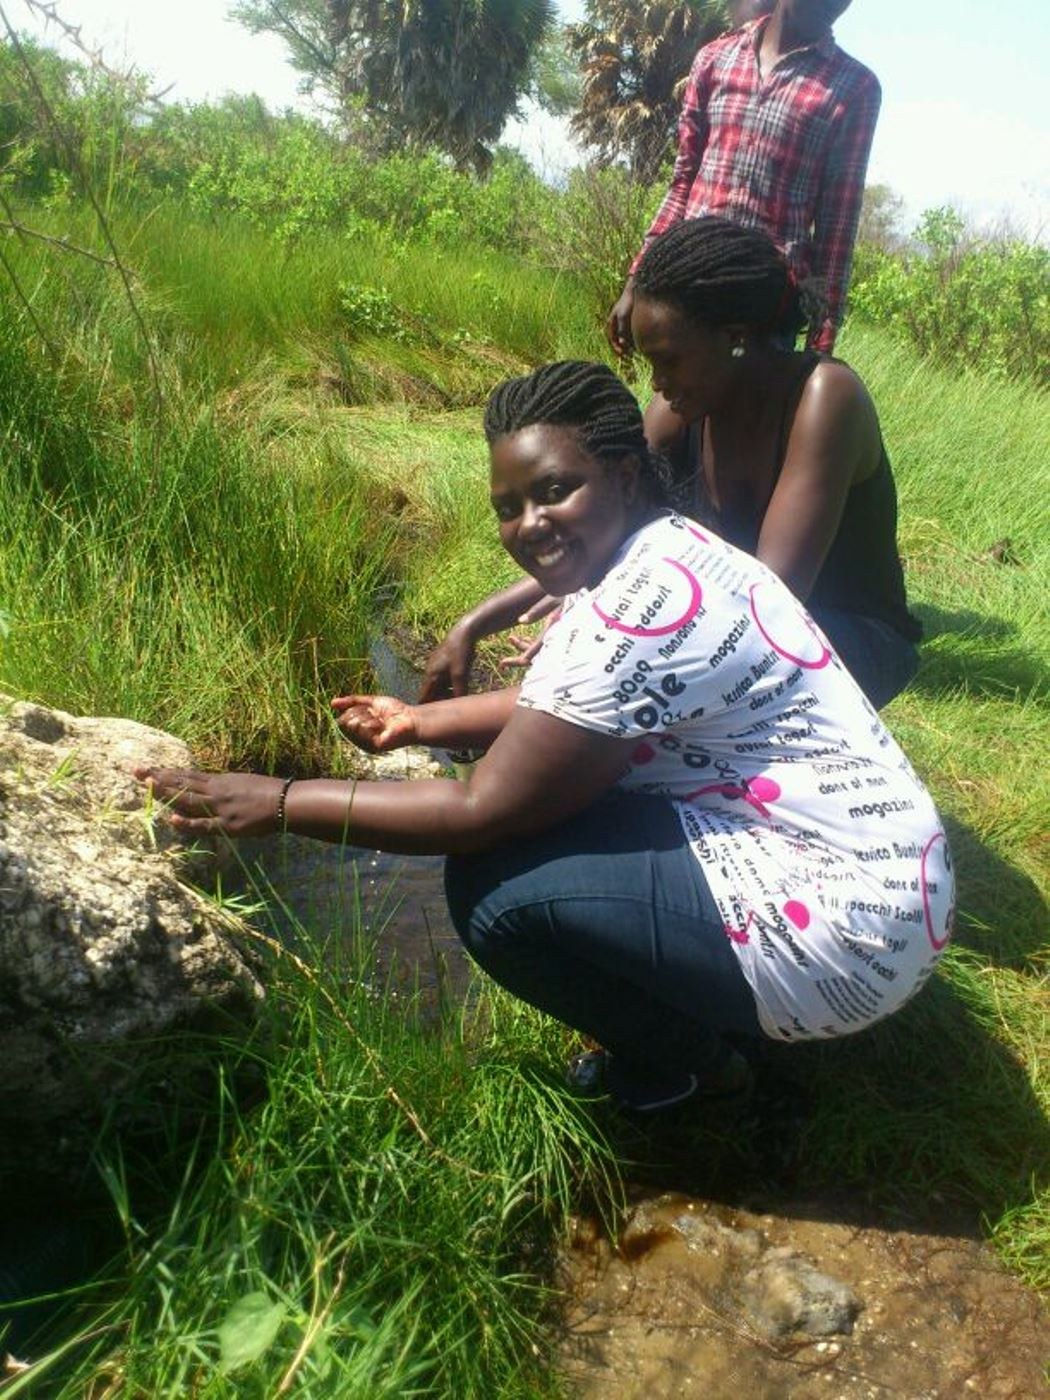 Tourists get the feel of Kanangarok hot springs in Kidepo valley national park. Daudi Nana